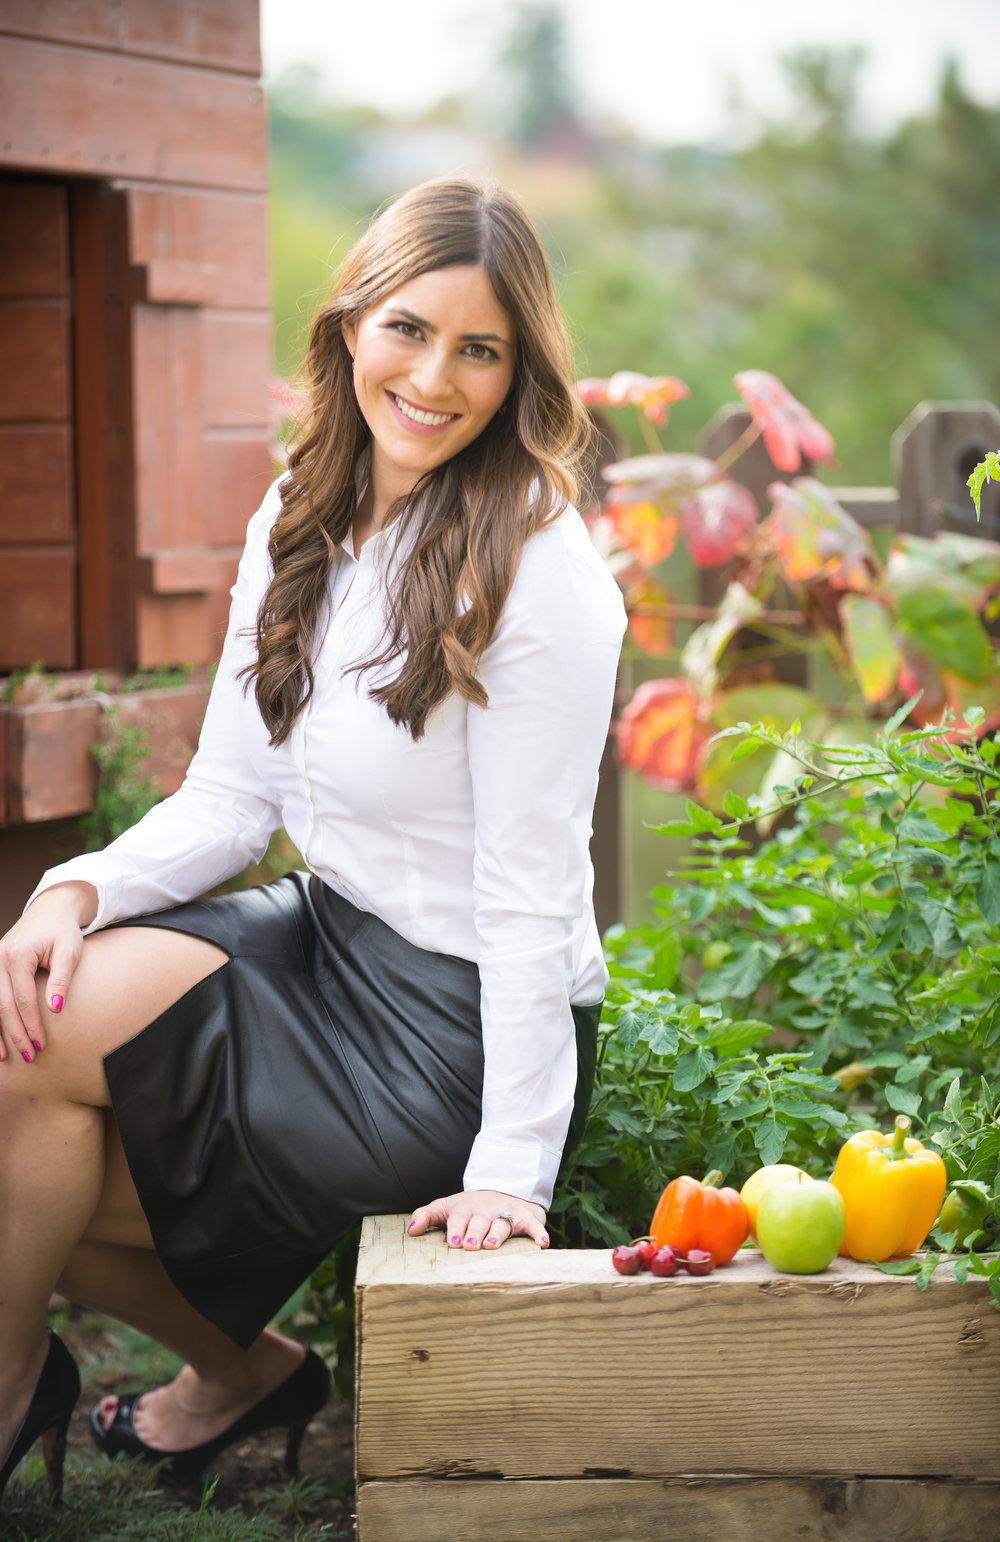 tricia-silverman-testimonial-expert-educator-entrepreneurship